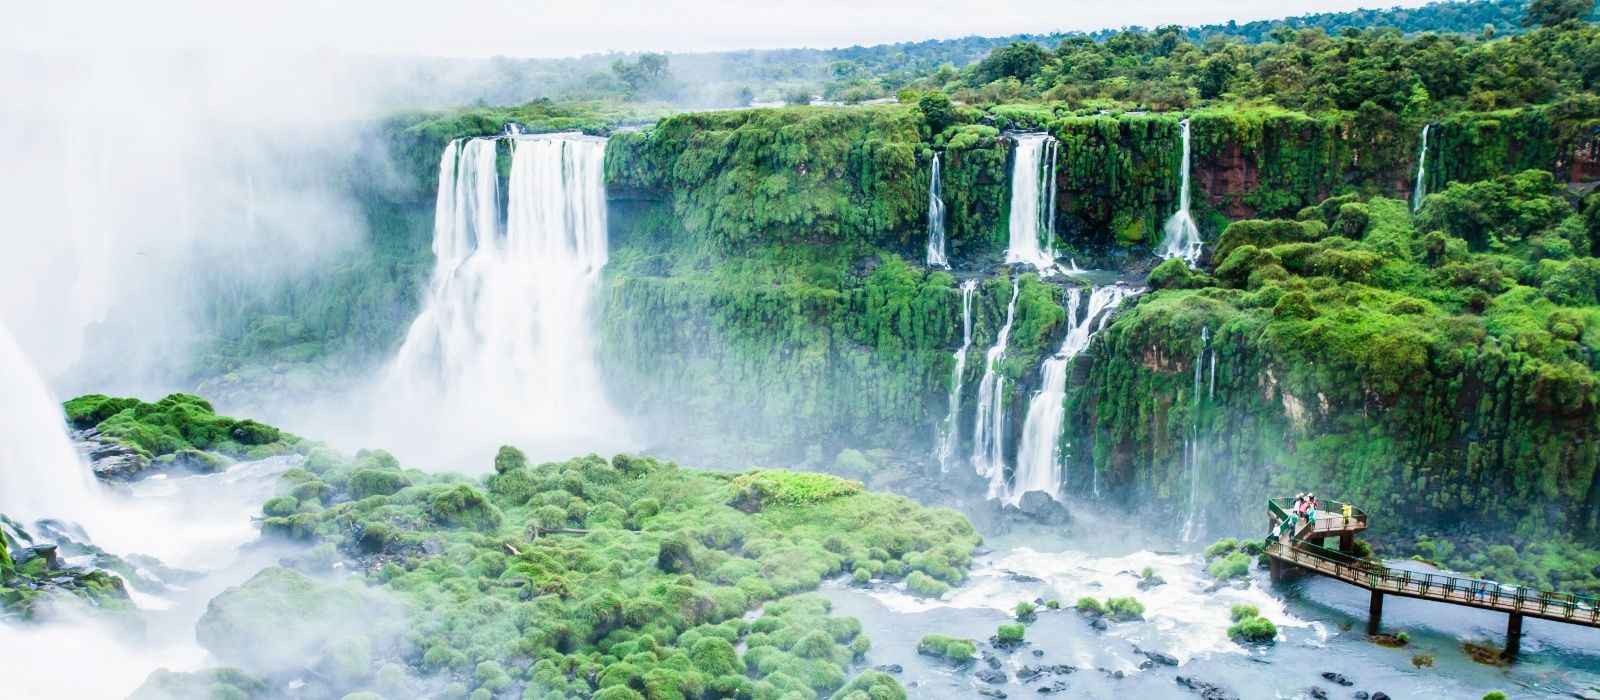 Brasilien Naturreise: Wasserfälle, Pantanal und Amazonas Urlaub 2